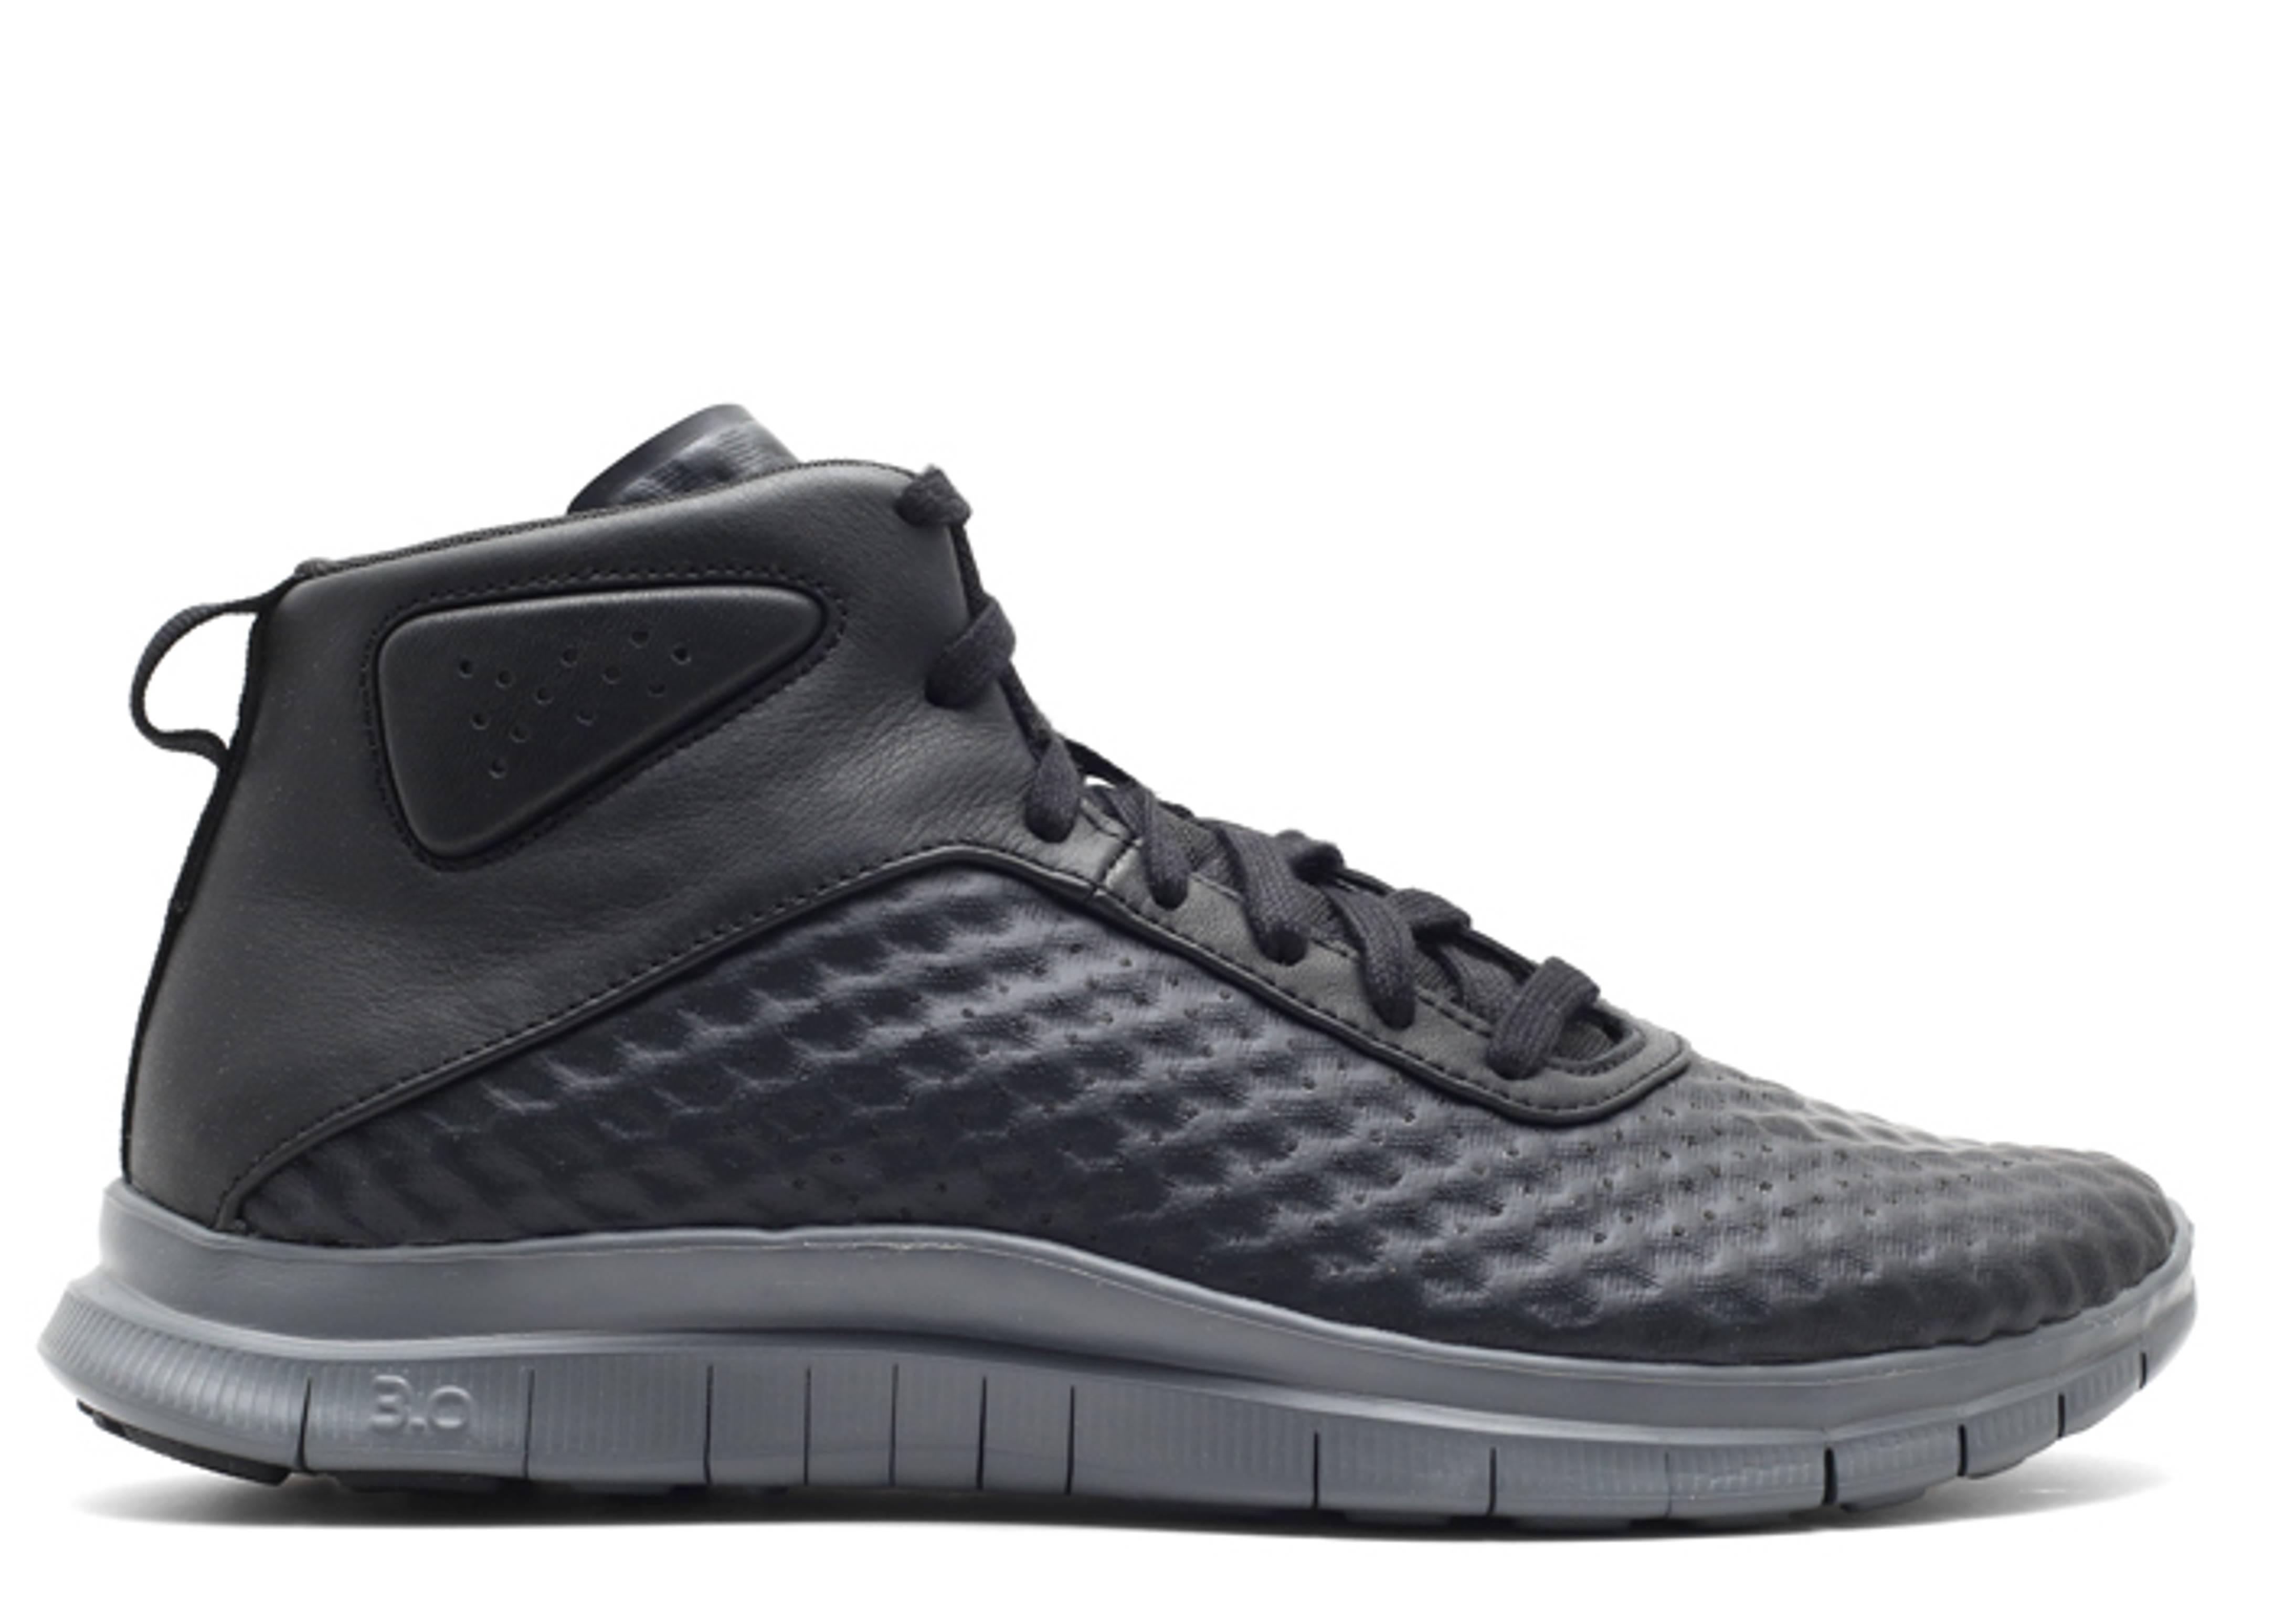 fd99bb310f2f Free Hypervenom Mid - Nike - 705496 001 - black blavk-dark grey ...